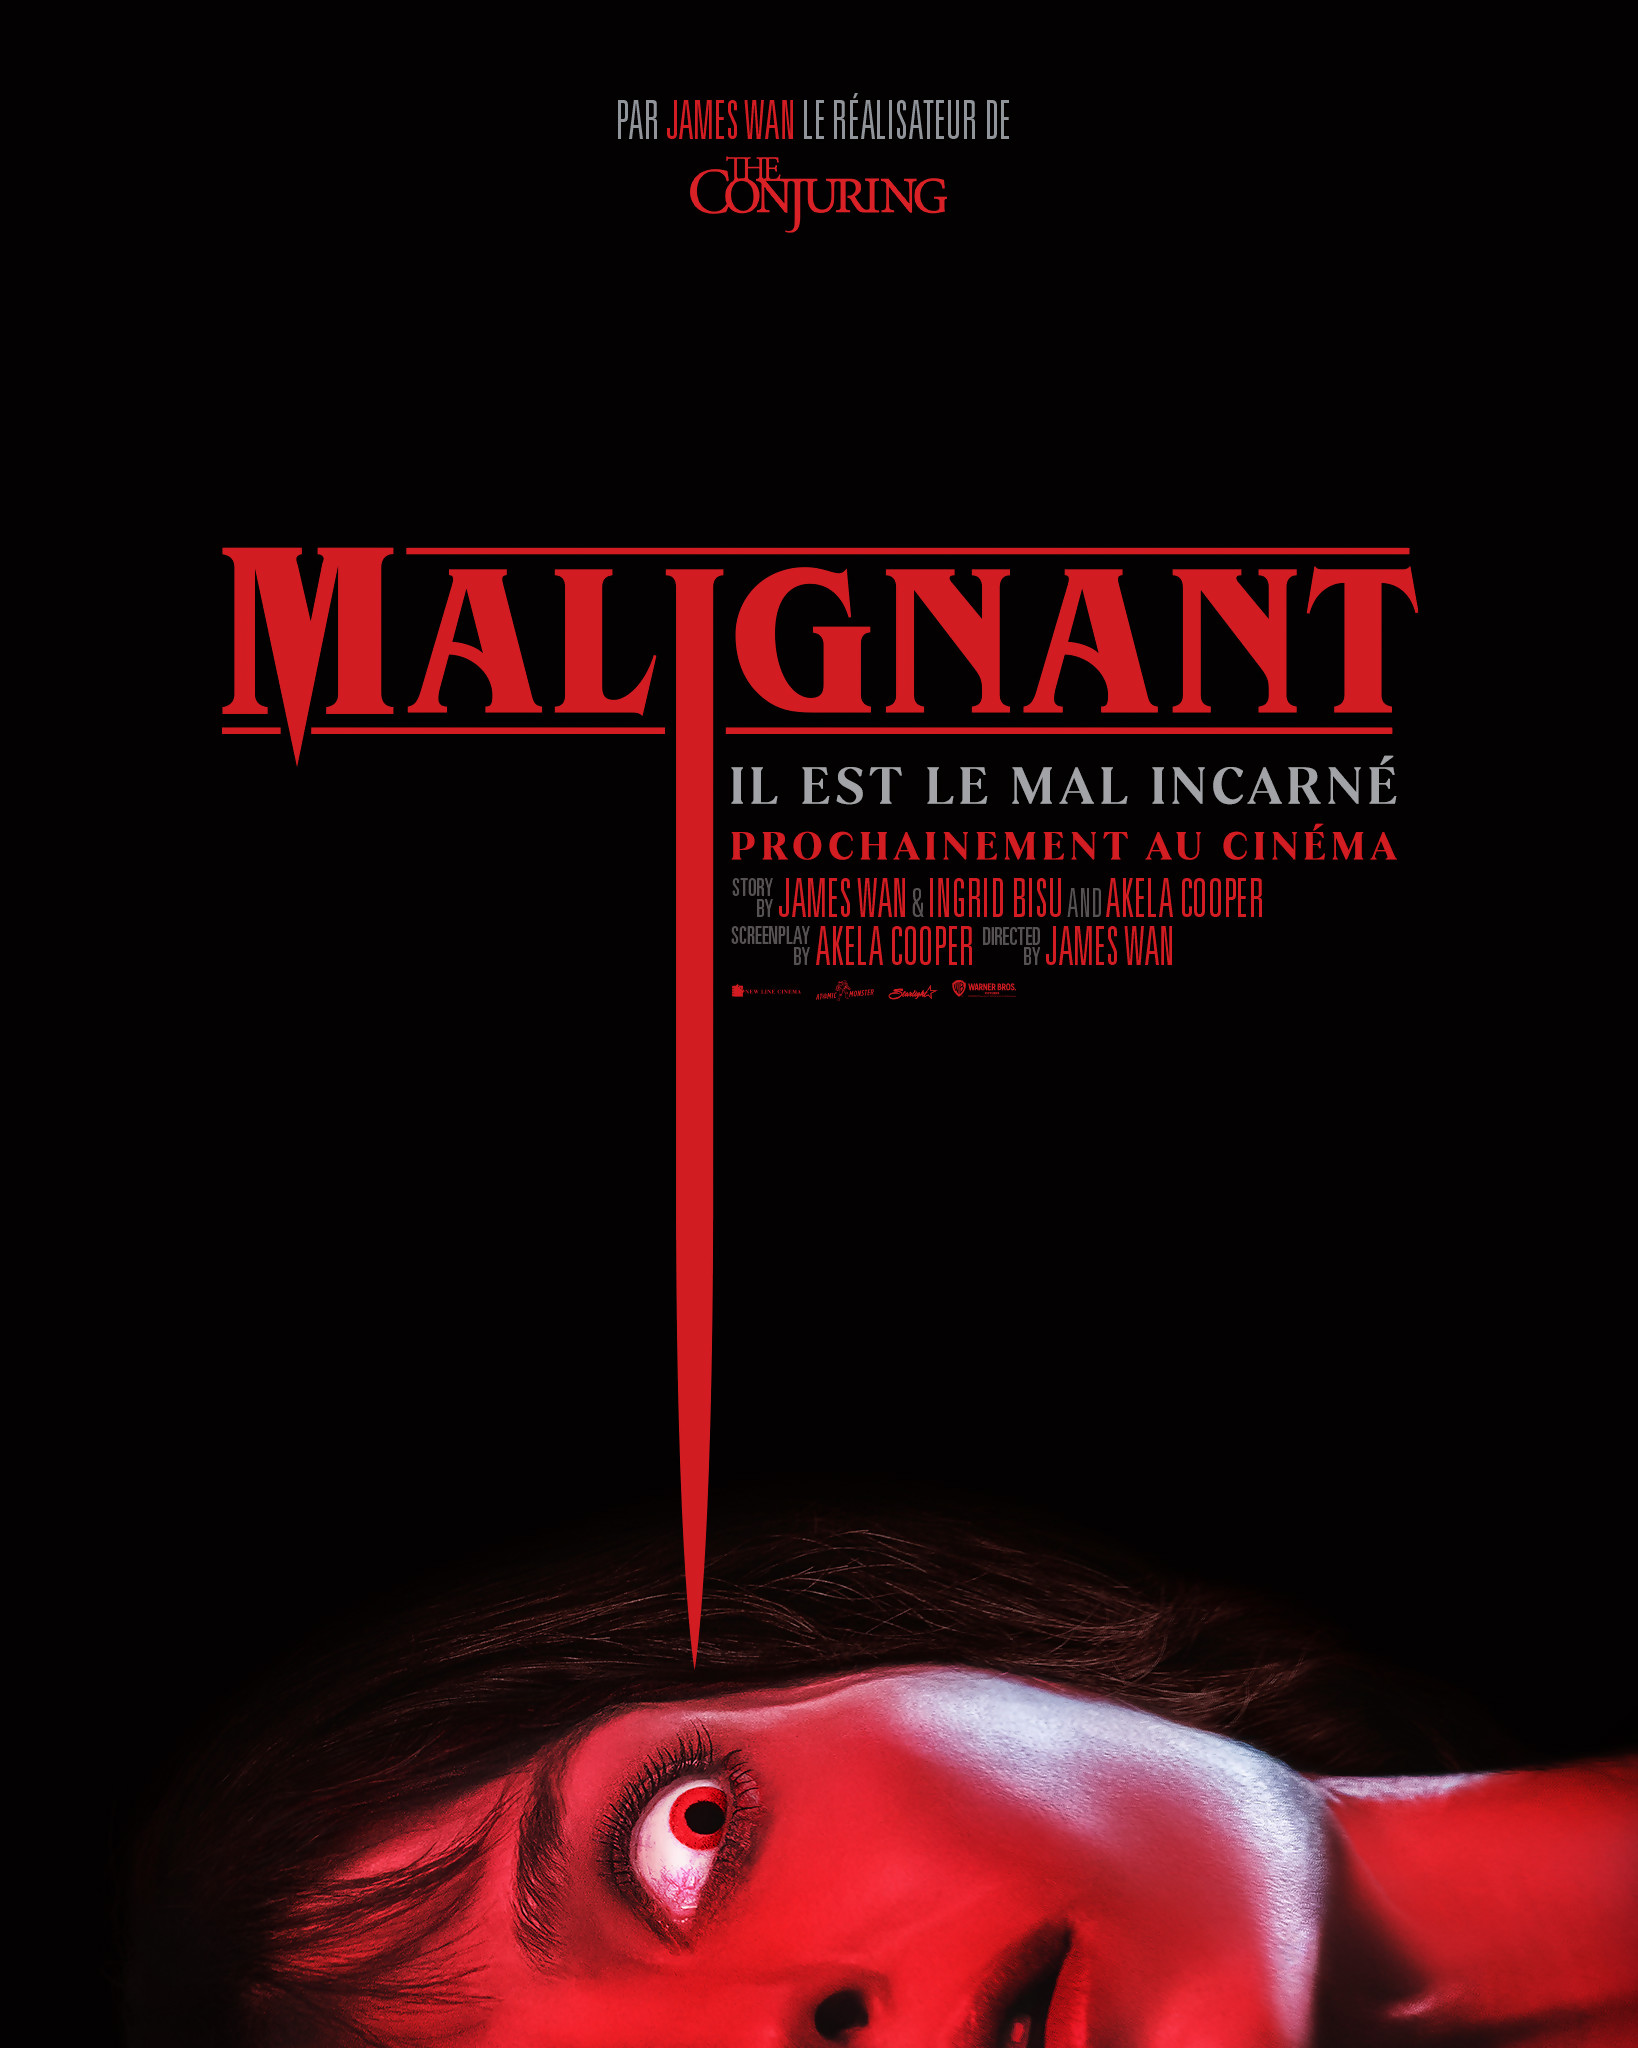 affiche du film Malignant